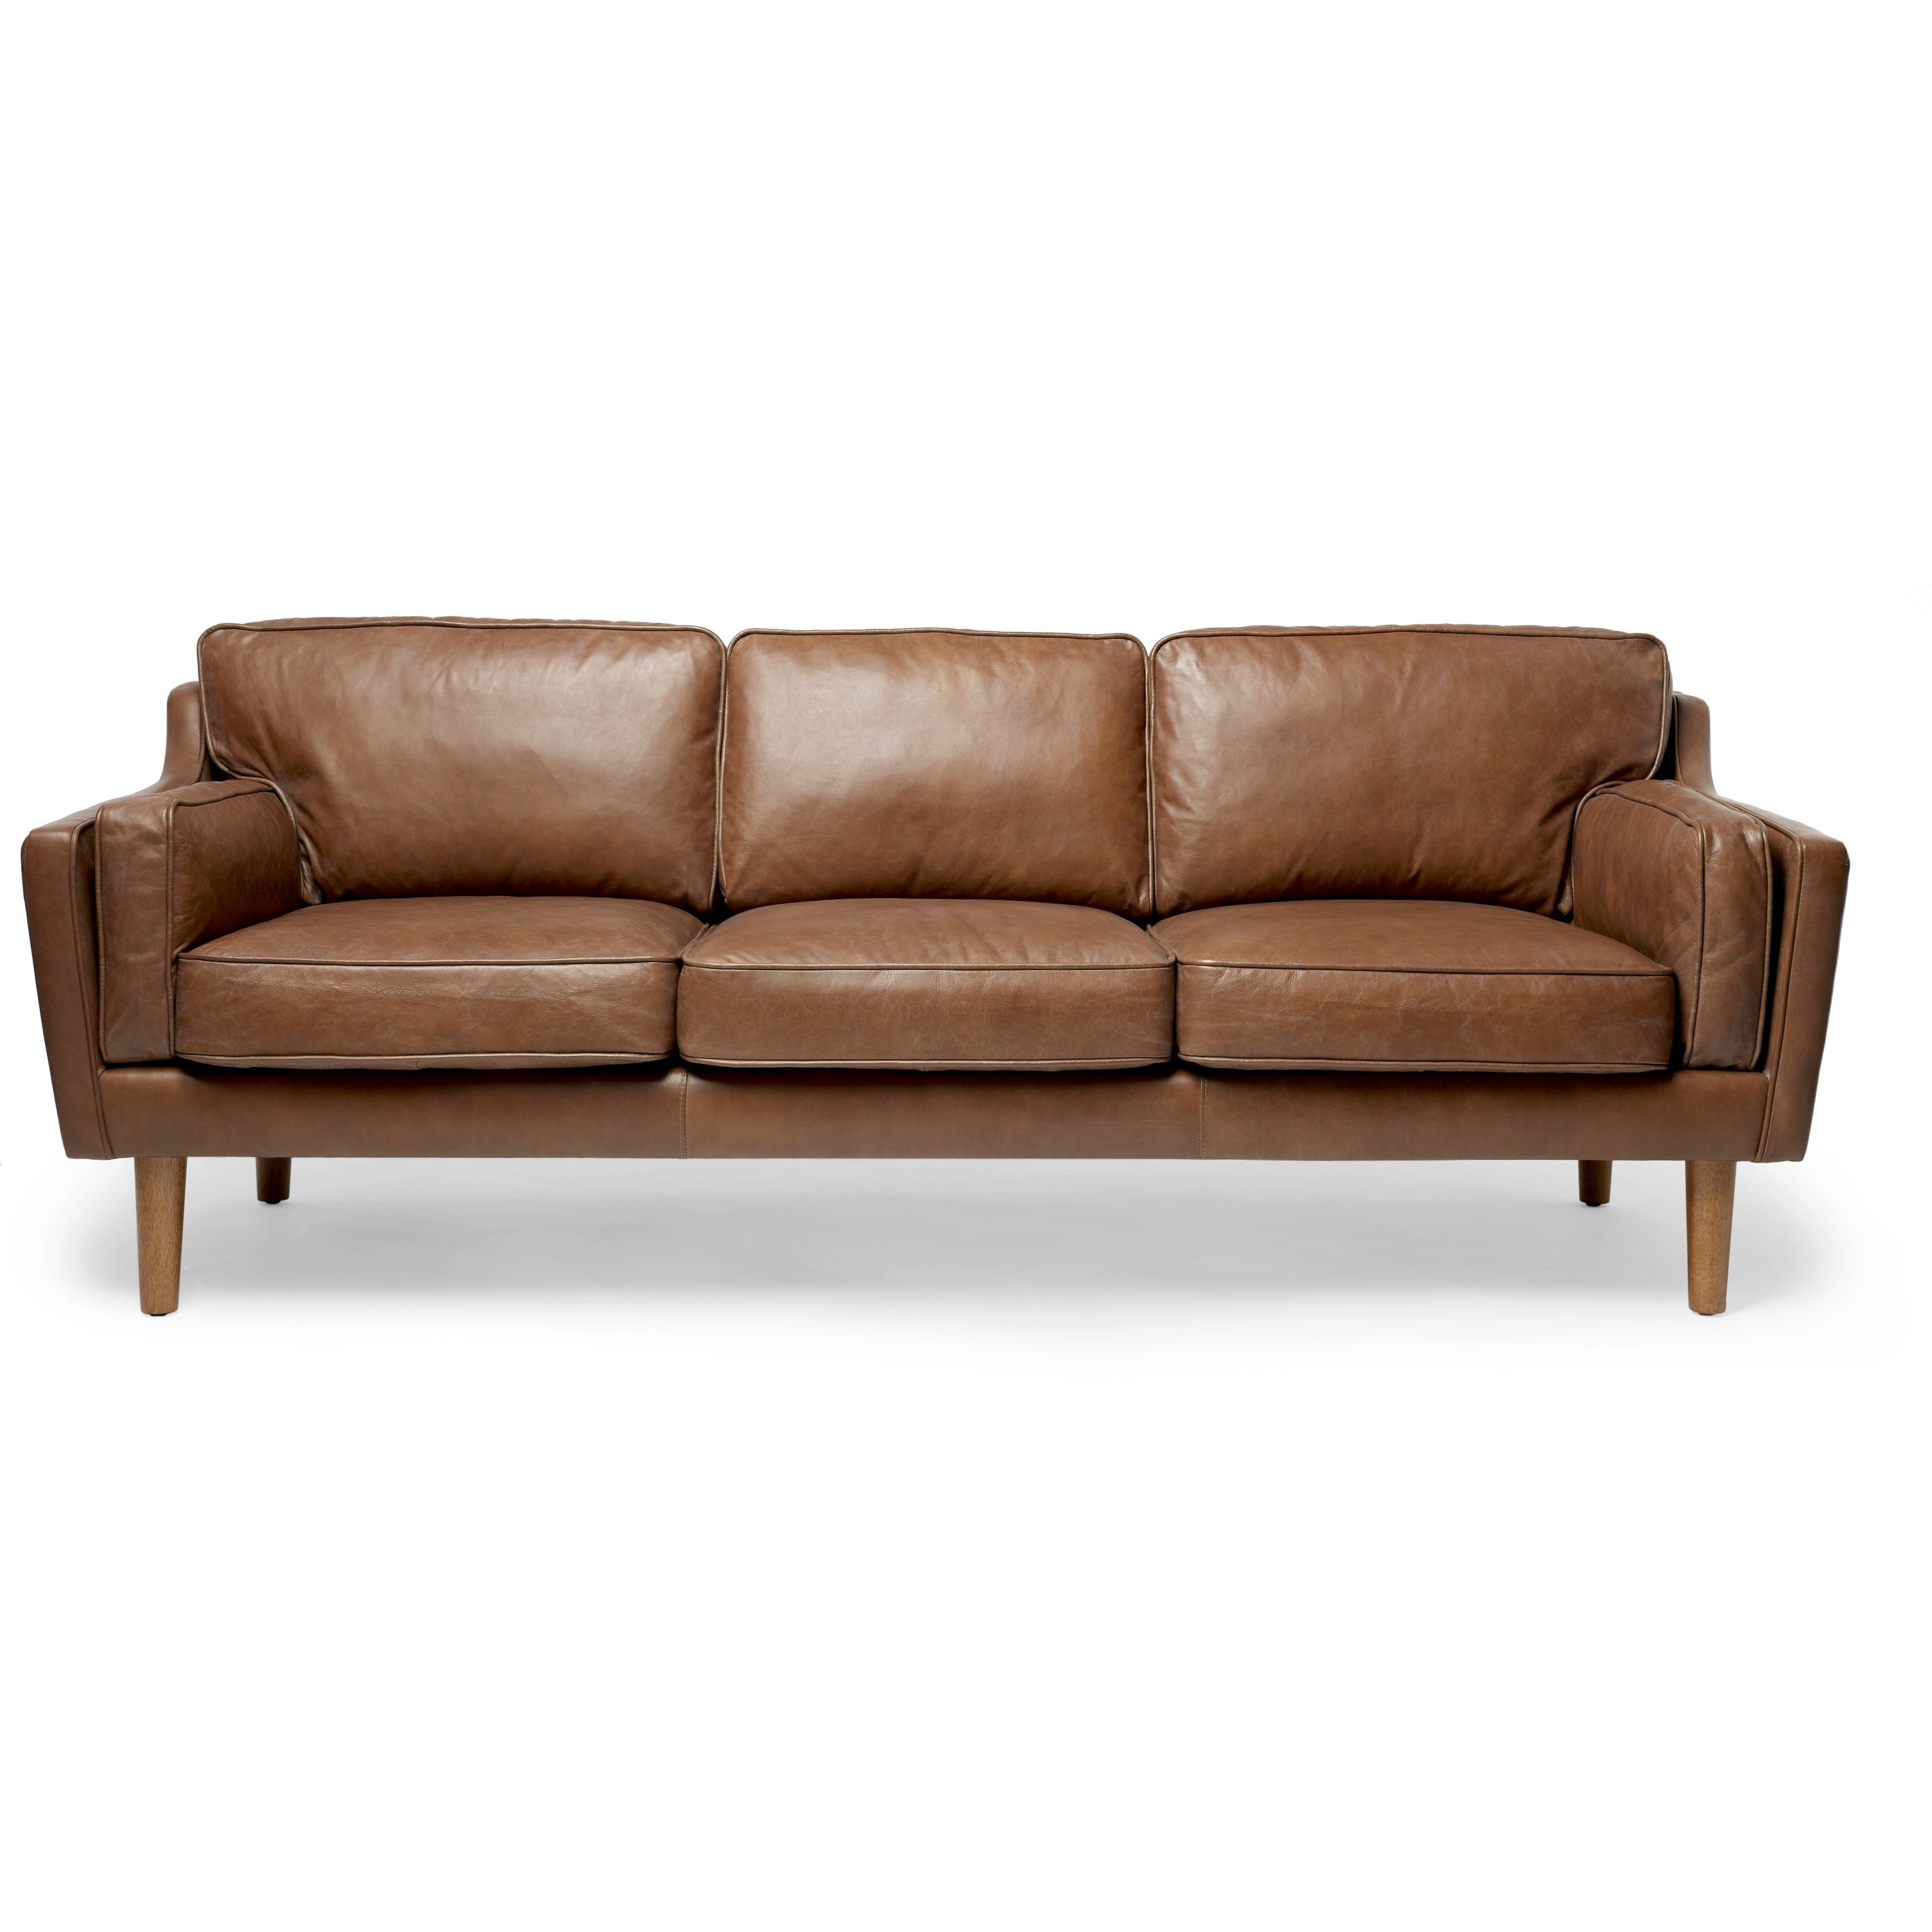 Shop Jasper Laine Beatnik Oxford Leather Tan Sofa   Free Shipping Today    Overstock.com   8117559